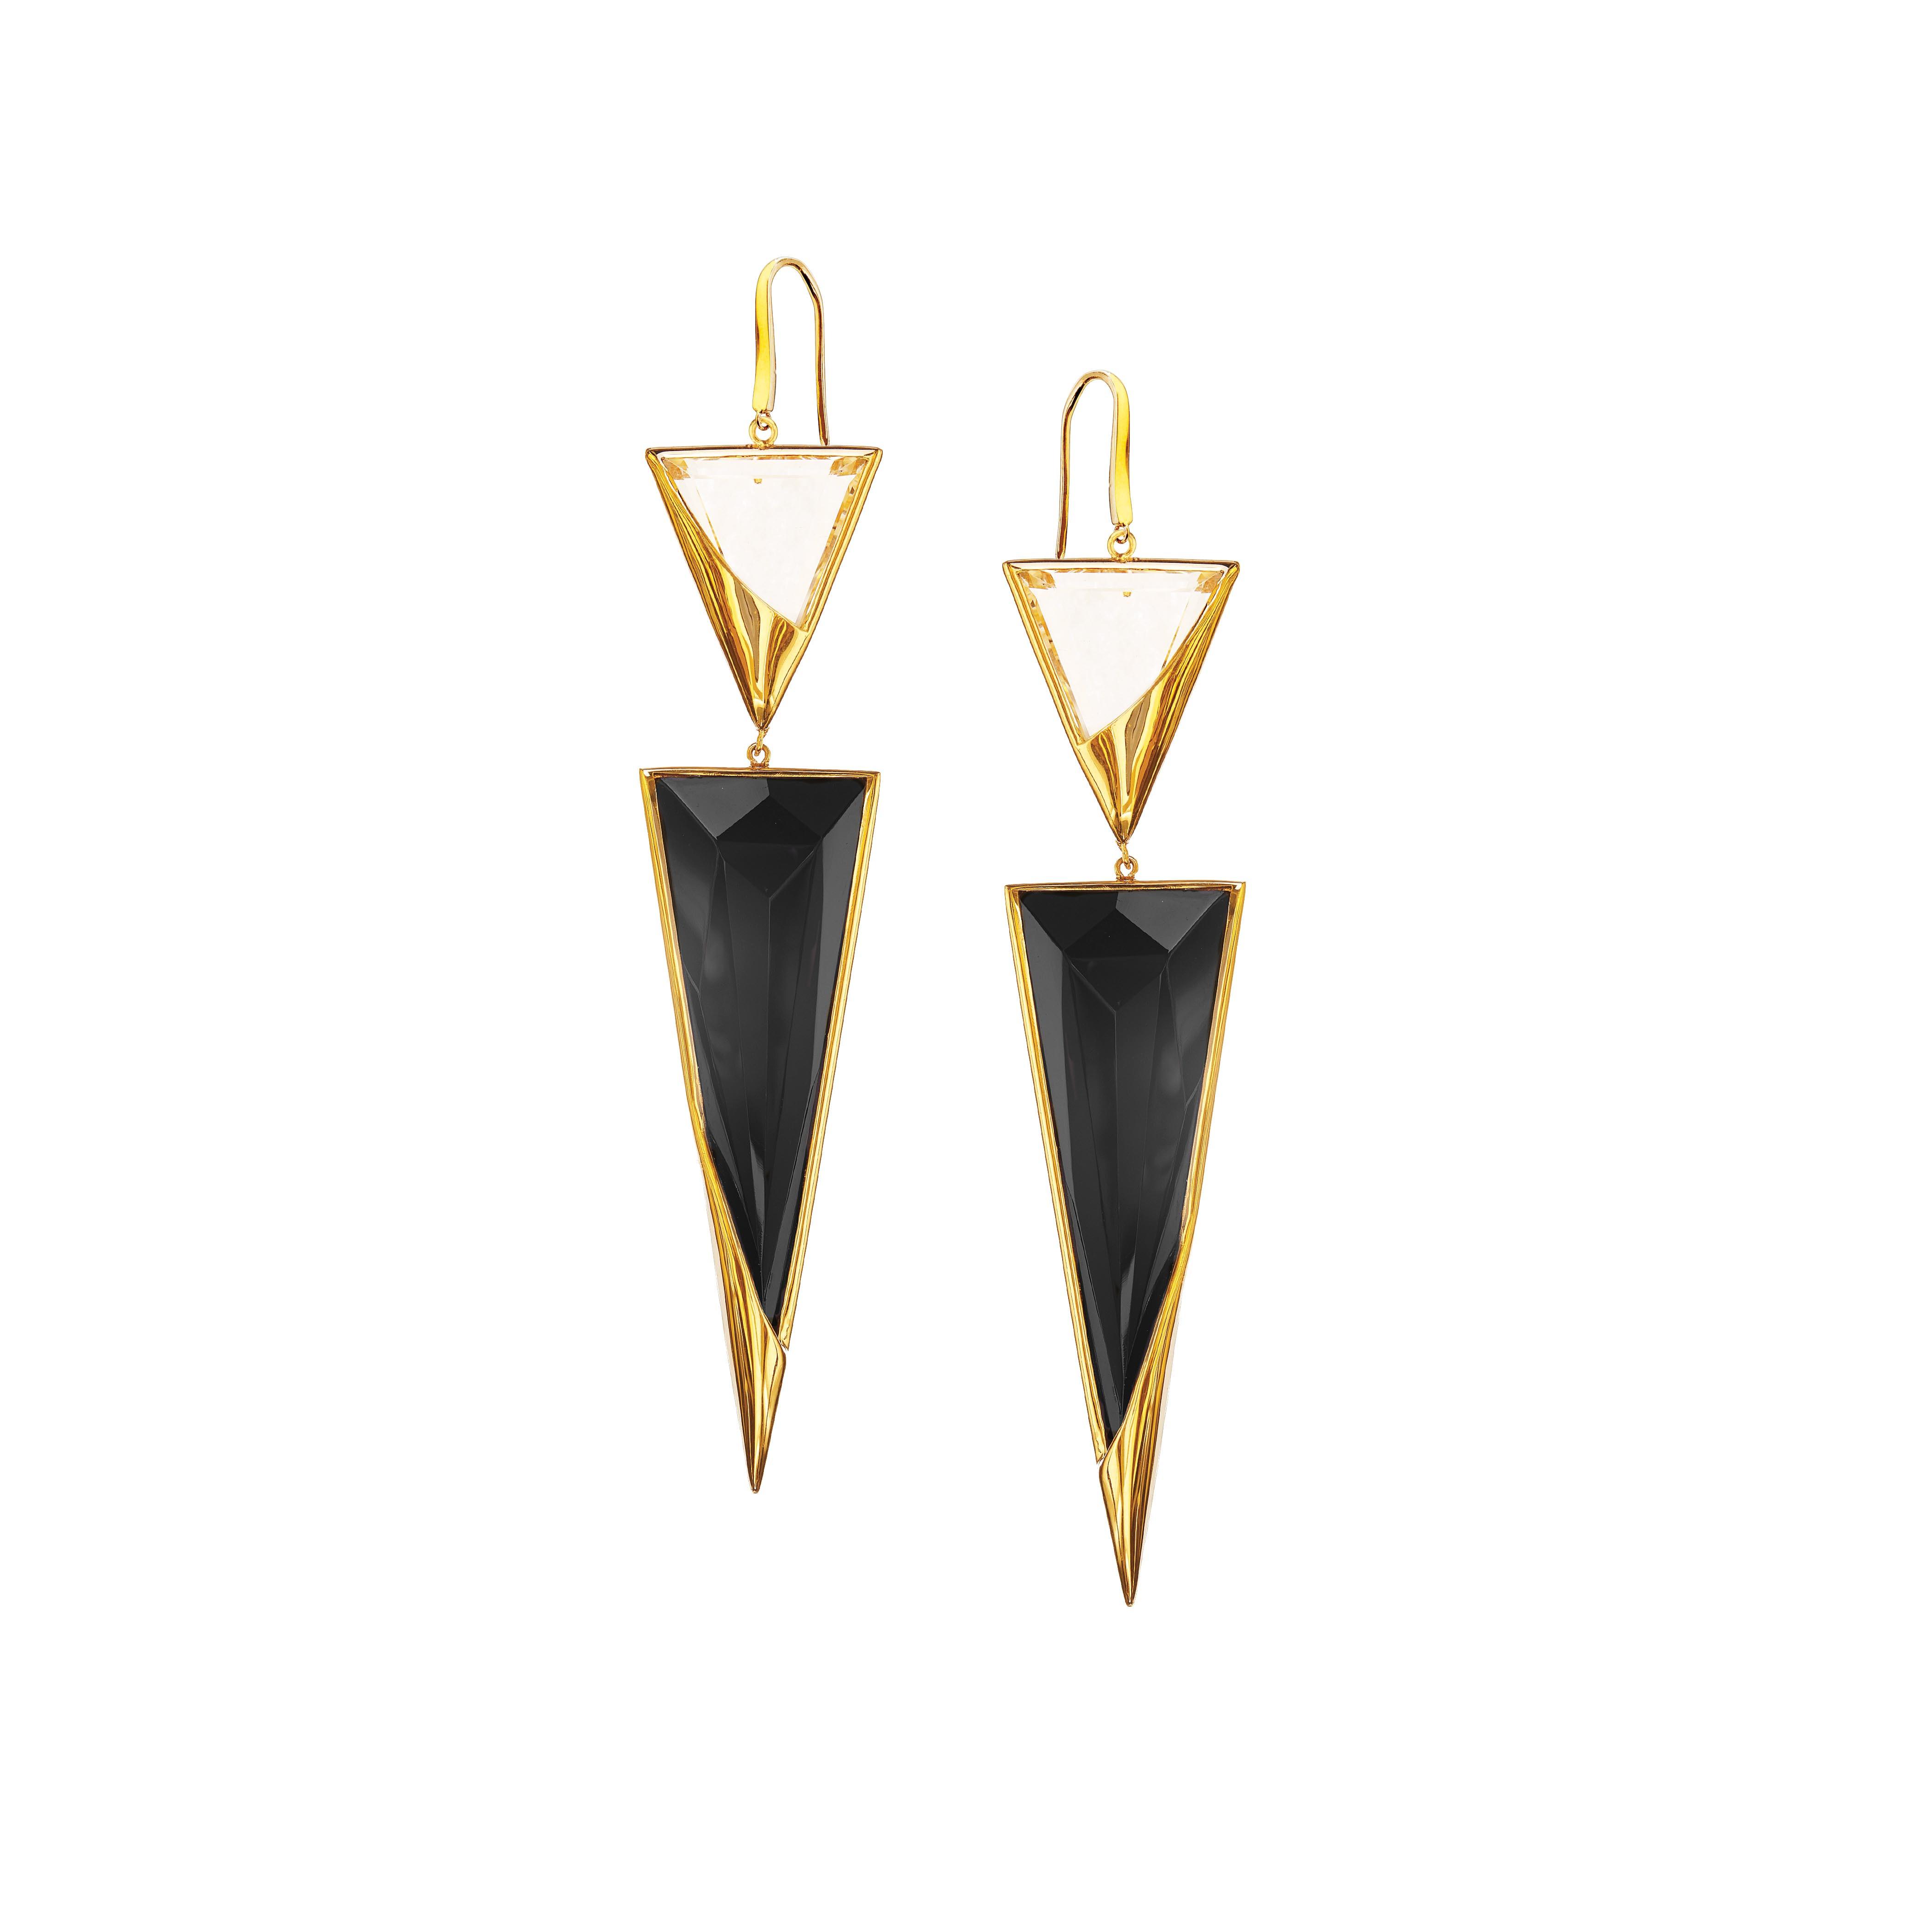 New Lana Jewelry Black Onyx & Crystal Jet Earrings